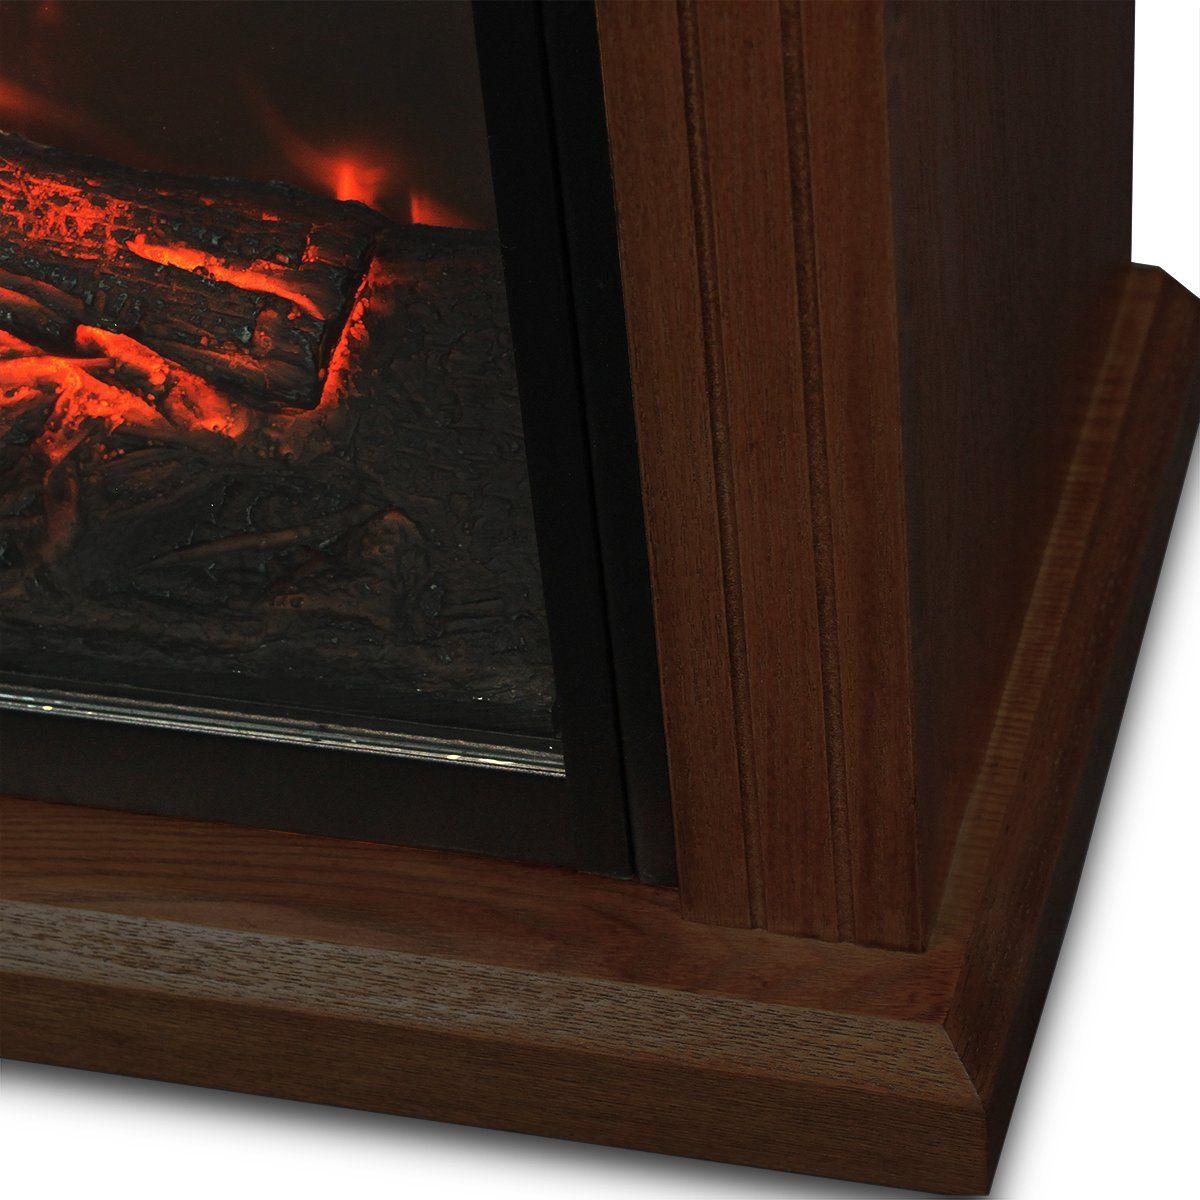 XtremepowerUS Infrared Quartz Electric Fireplace Heater ...